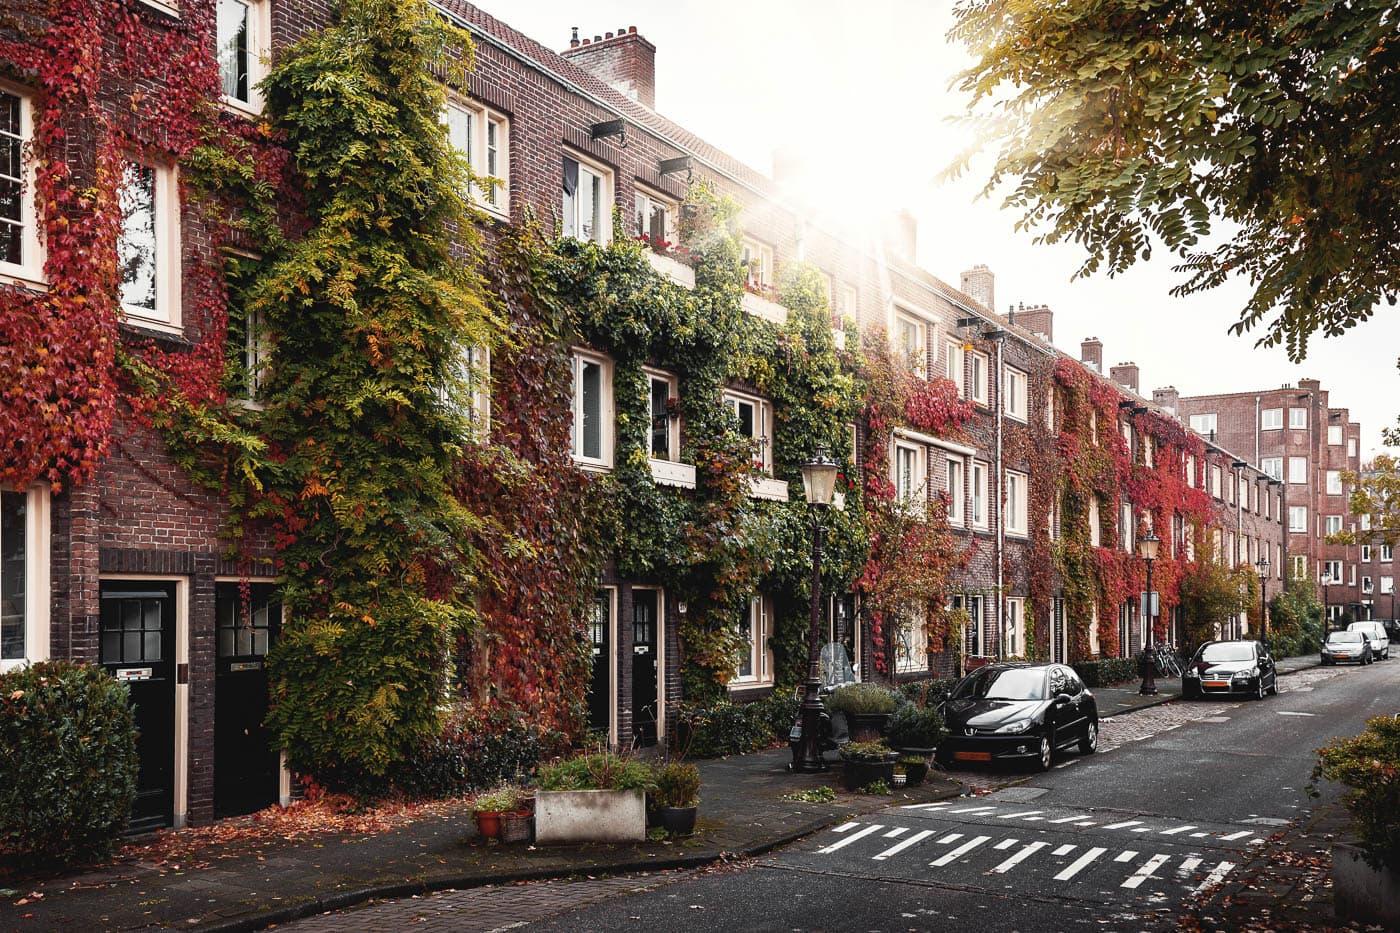 Begrünte Fassaden in Amsterdam, Niederlande